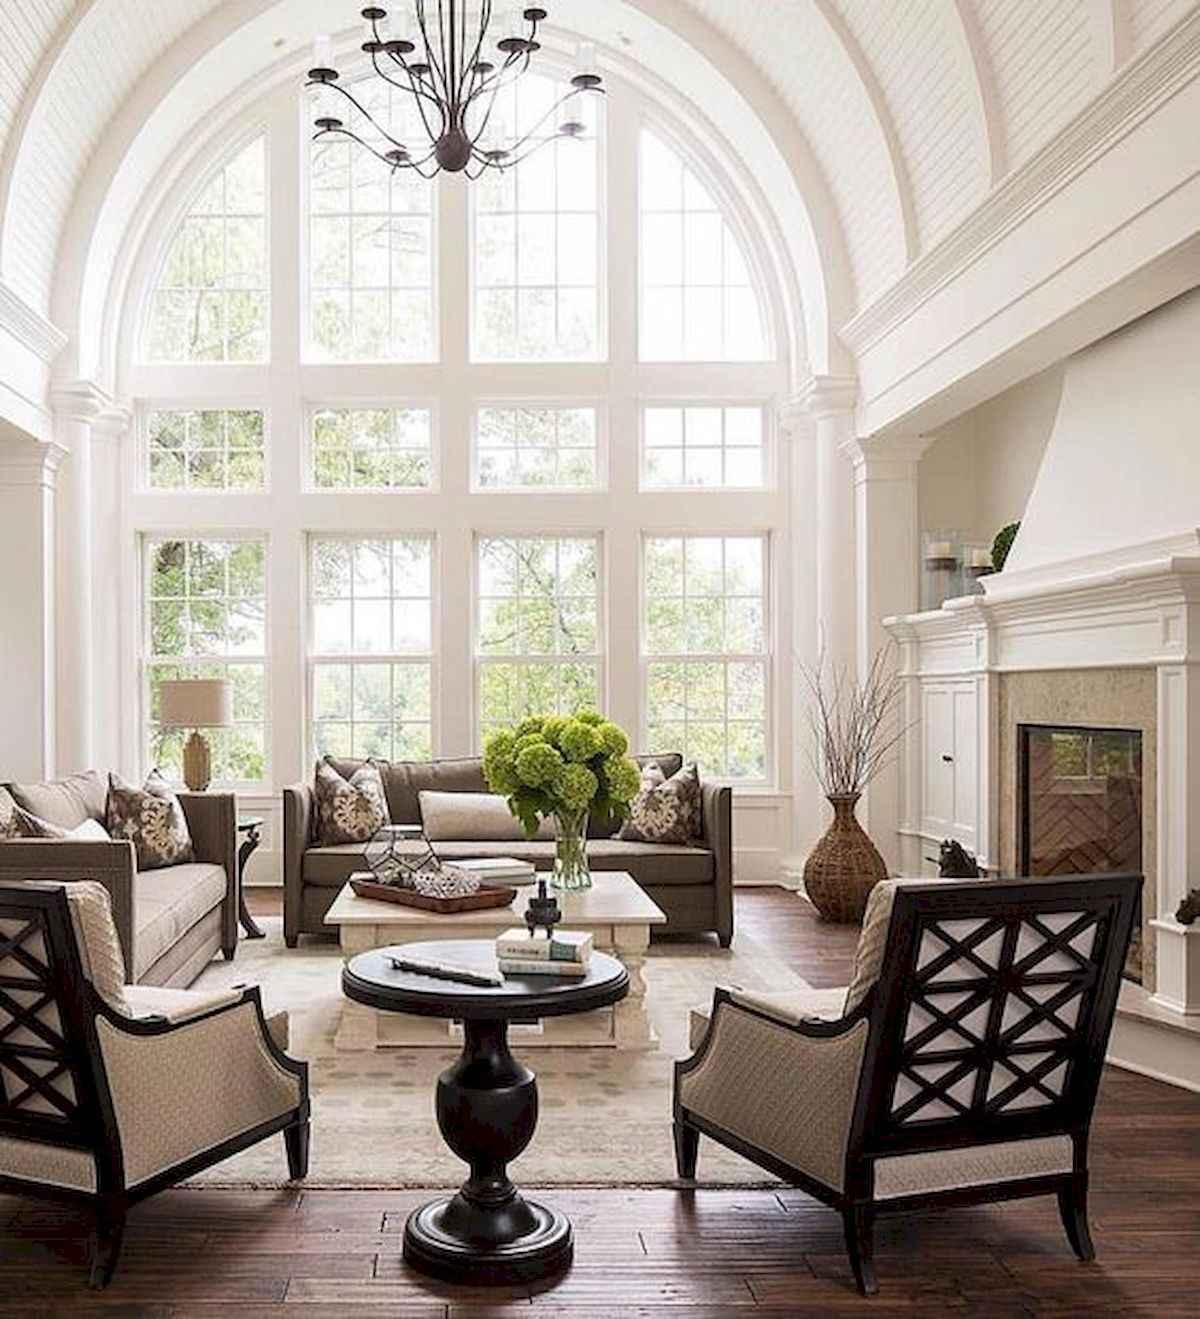 Home Decorating Ideas Farmhouse 50 Elegant Farmhouse: 30 Elegant Farmhouse Living Room Decor Ideas